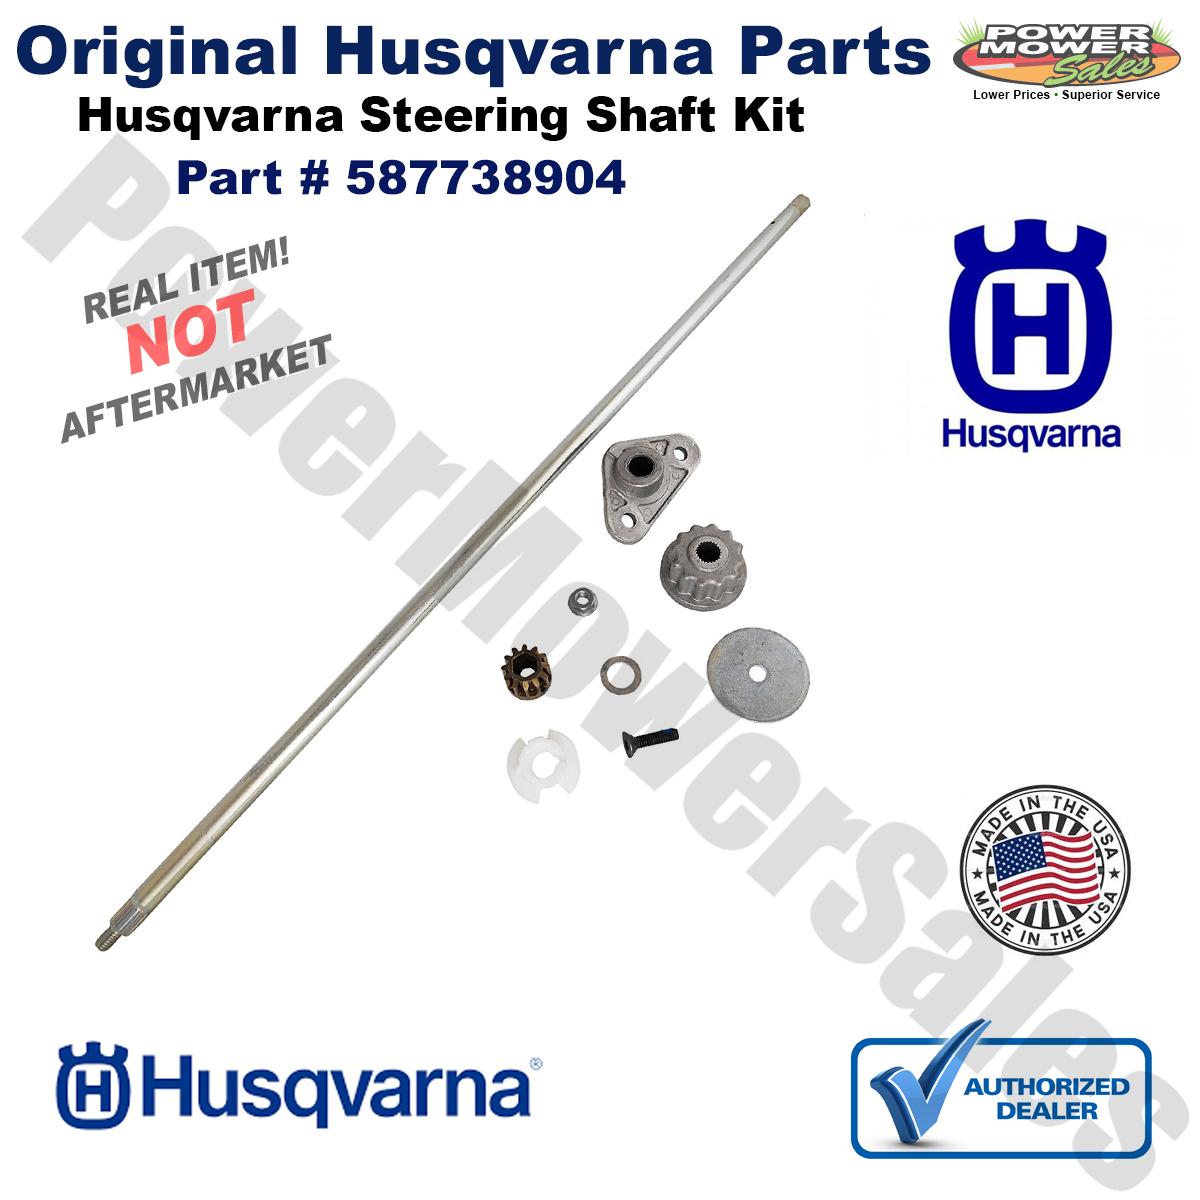 hight resolution of husqvarna steering shaft service kit for lawn mowers yth 2246 2348 2448 2454 587738904 532408219